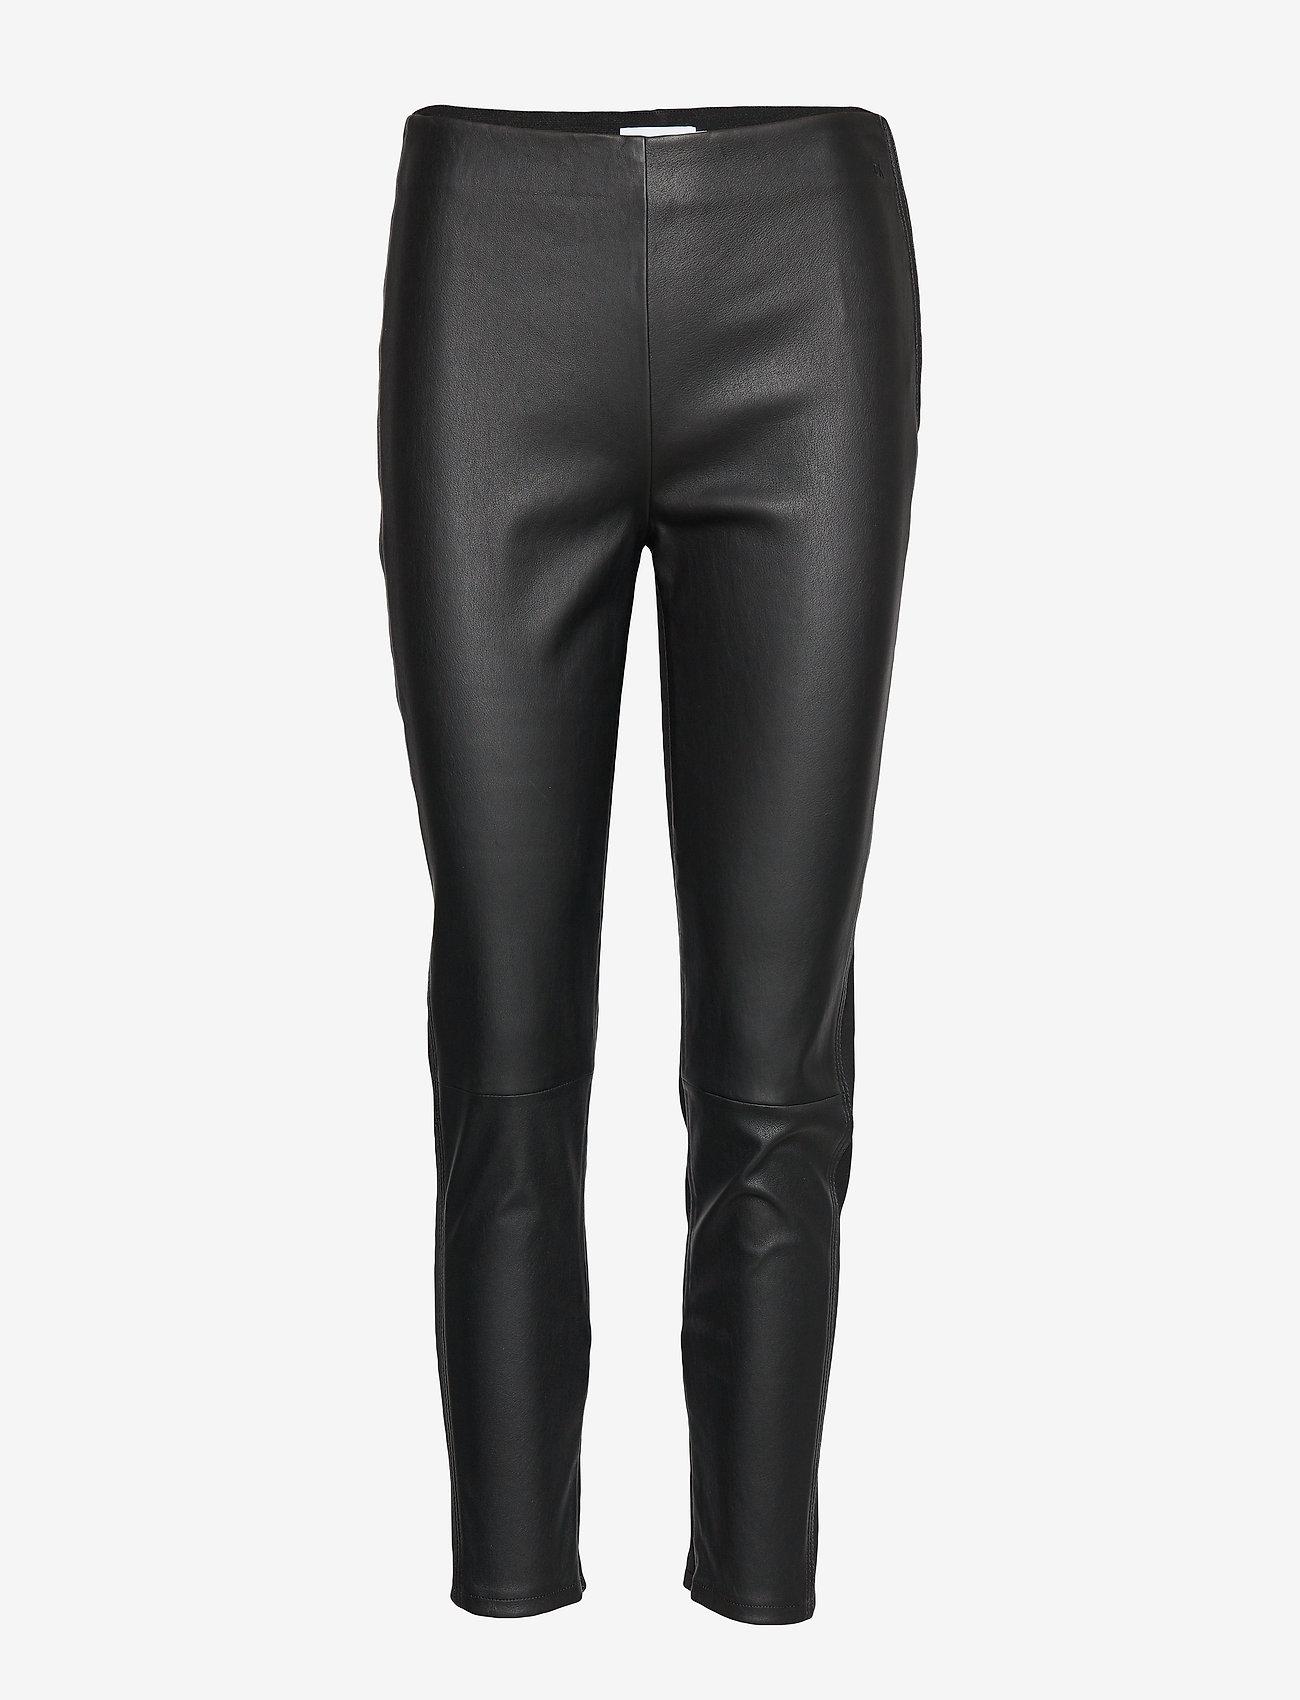 Calvin Klein - ESSENTIAL LEATHER MIX LEGGING - lederhosen - calvin black - 0